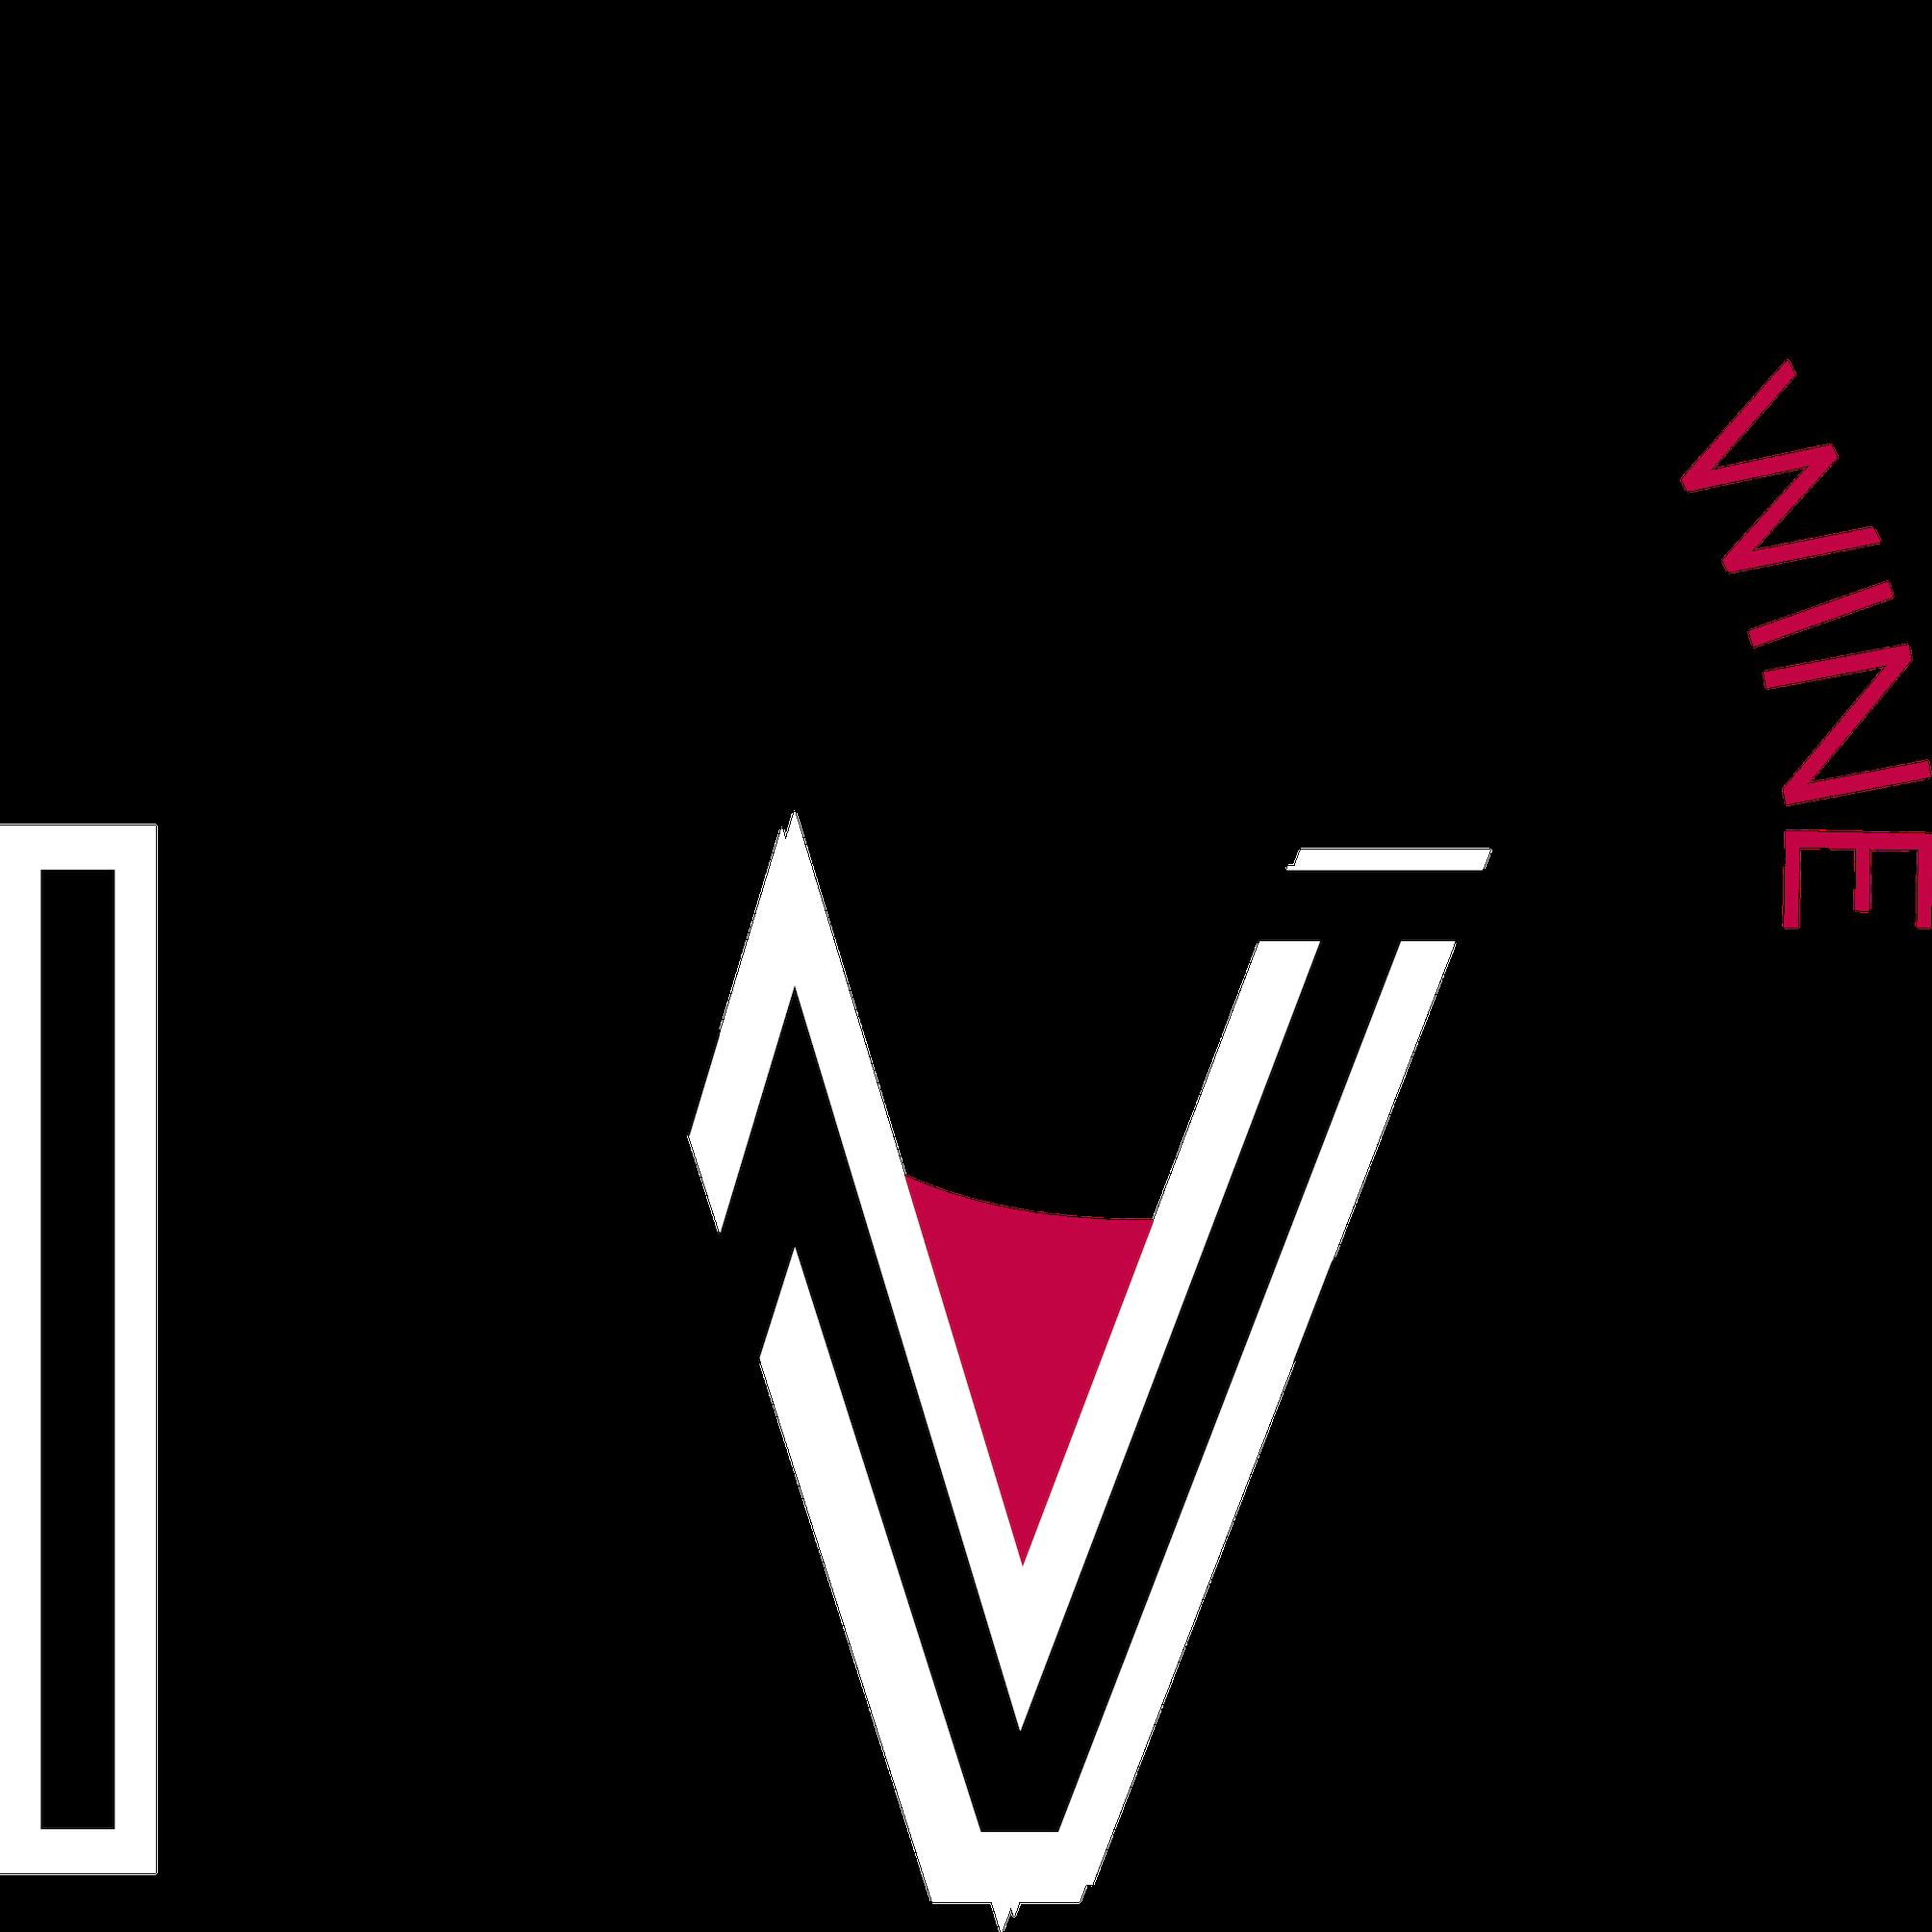 International Wine Group